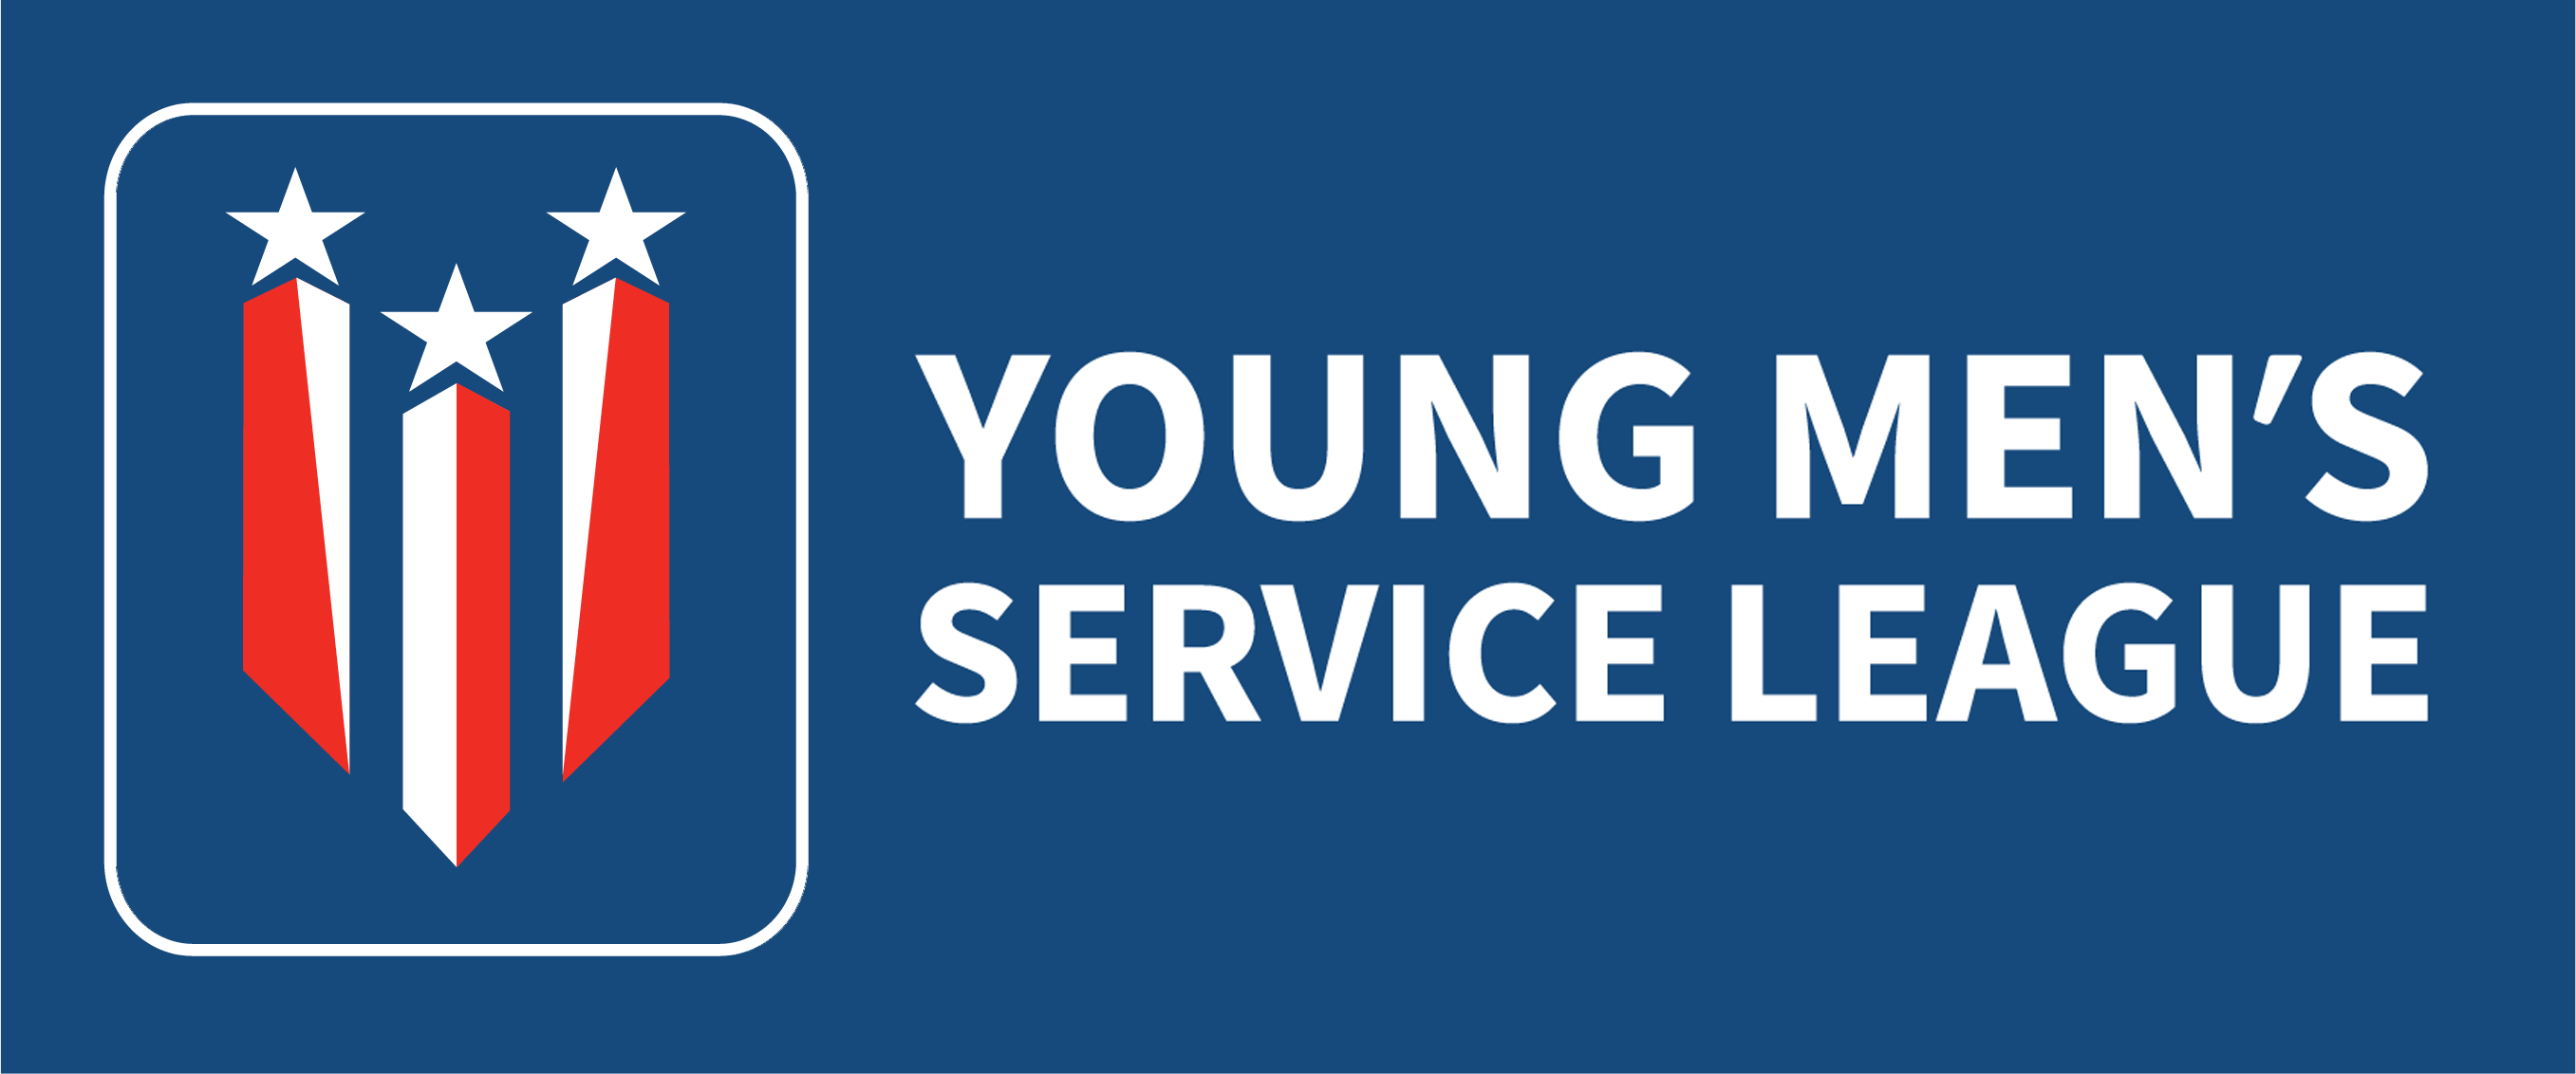 Young Mens Service League logo